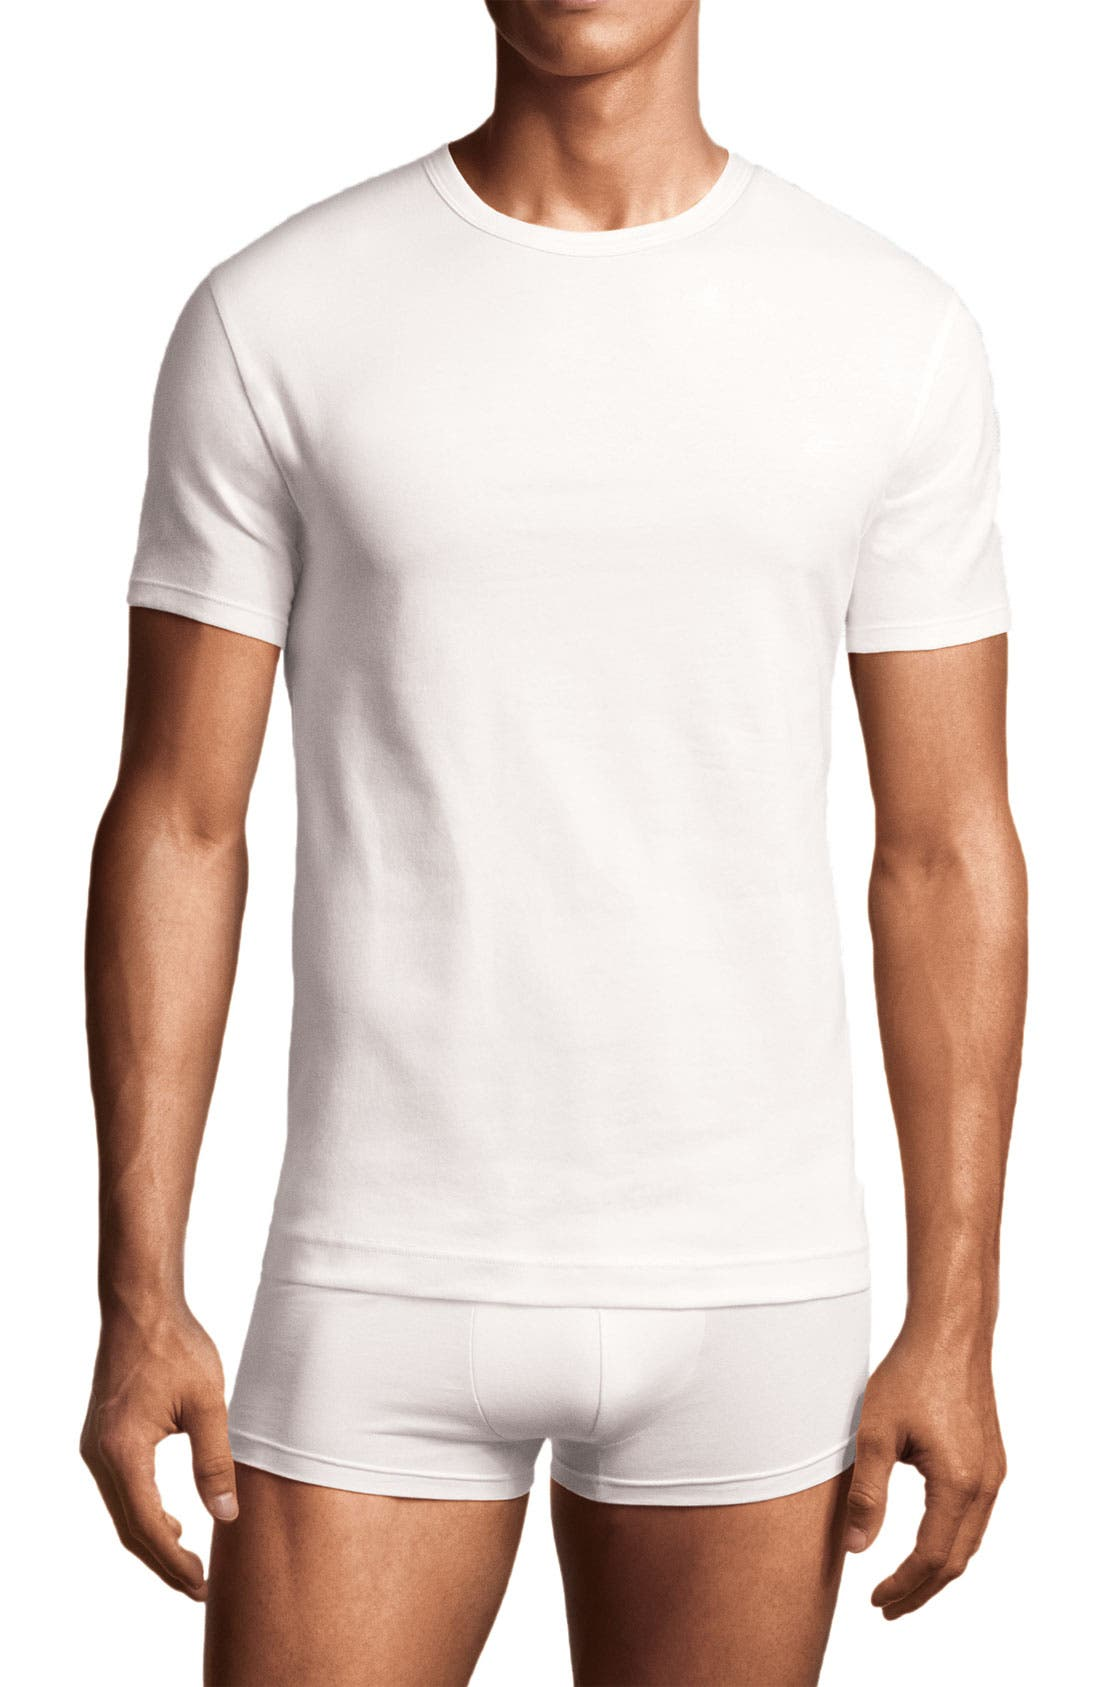 Main Image - Calvin Klein Crewneck T-Shirt (2-Pack) (Tall)